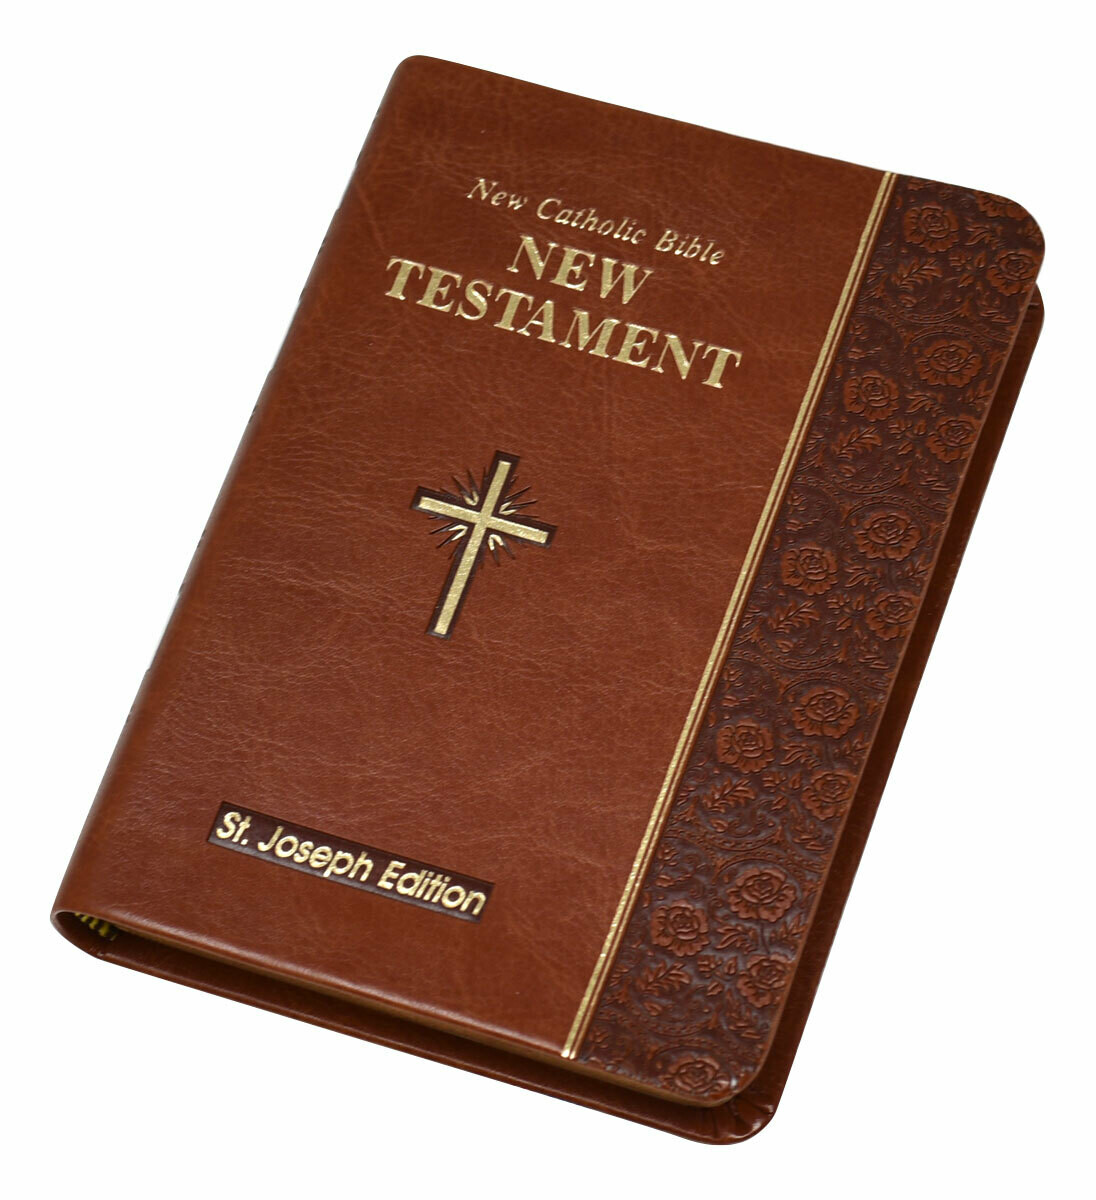 St. Joseph NCB New Testament (Vest Pocket Edition)- Brown Imitation Leather Cover